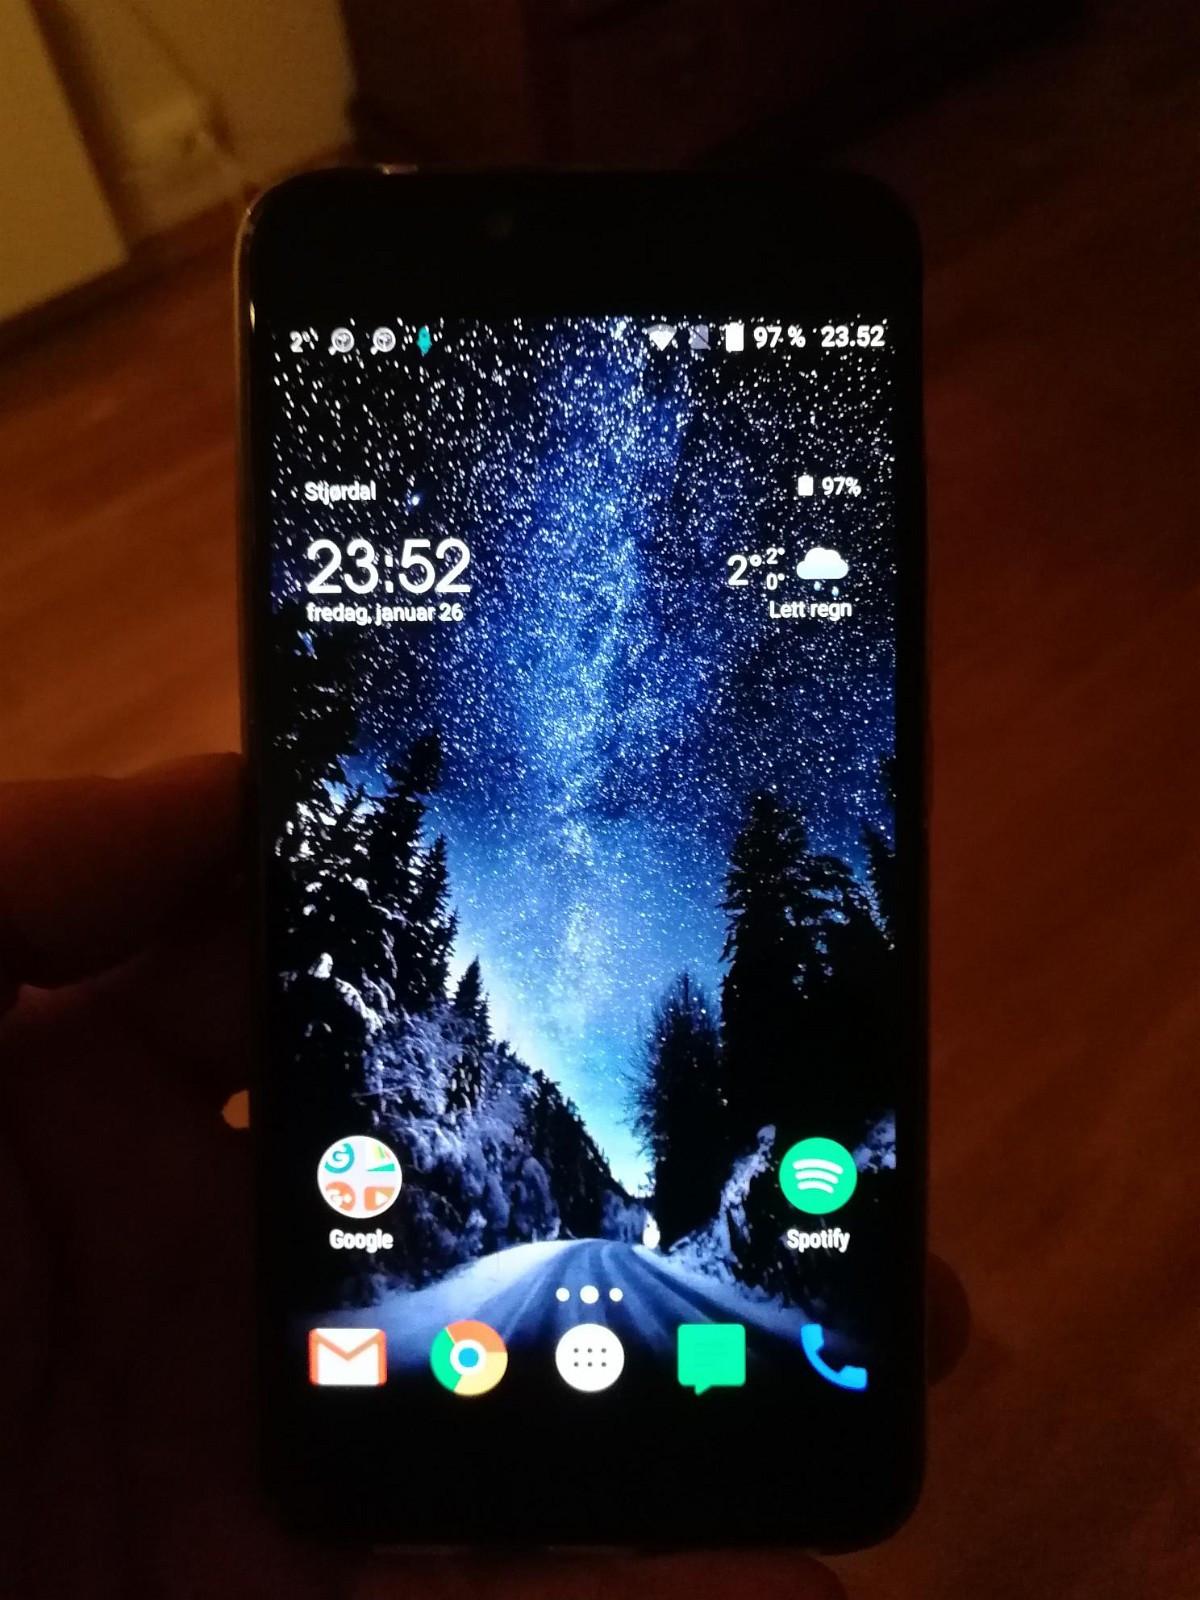 Umidigi Z1 pro 4 GB 64 GB dual sim - Stjørdal  - Umidigi Z1 pro 4 GB 64 GB dual sim sort  Brukt litt merker på skjermen. Men vises knapt amoled skjerm  Prosessor- MediaTek MTK6797X DecaCore 2.6GHz Cortex A53 (Helio X27) OS- Android 7.1.1 (N) SIM- Dual (Micro) - OBS - om du bru - Stjørdal